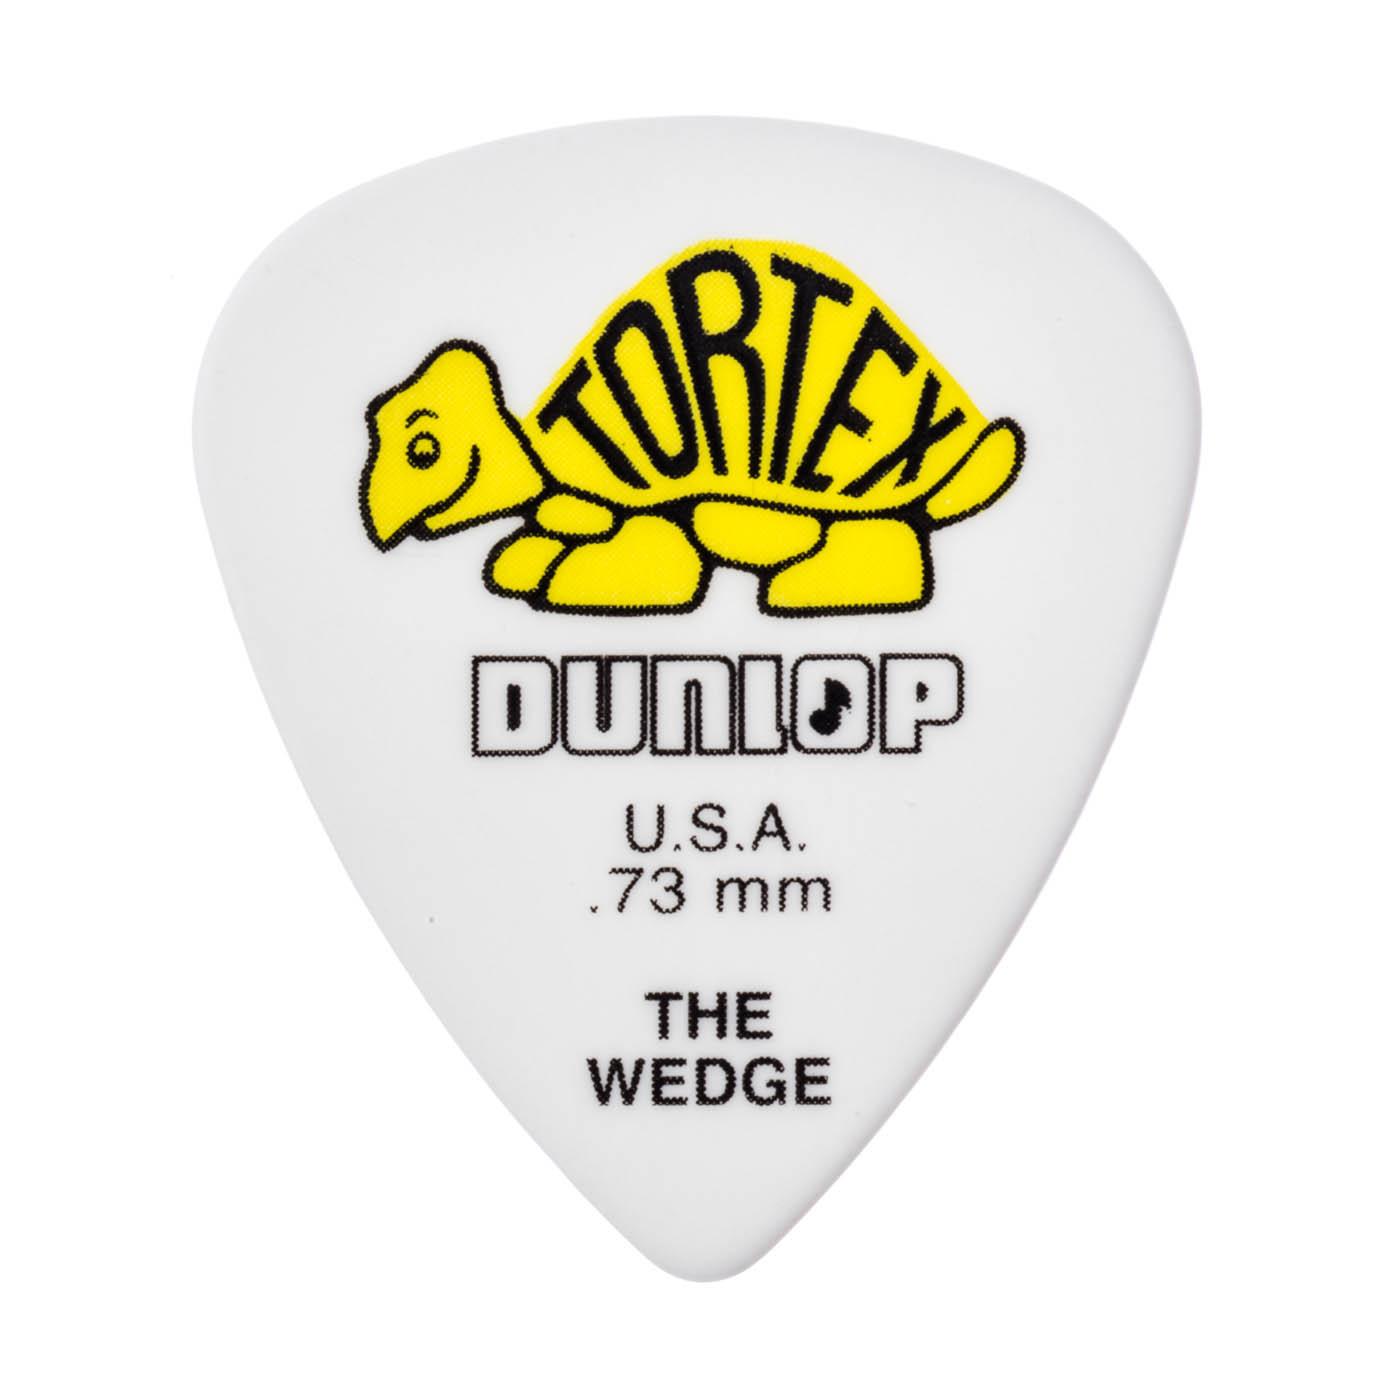 Dunlop - Tortex Wedge 0,73 yellow